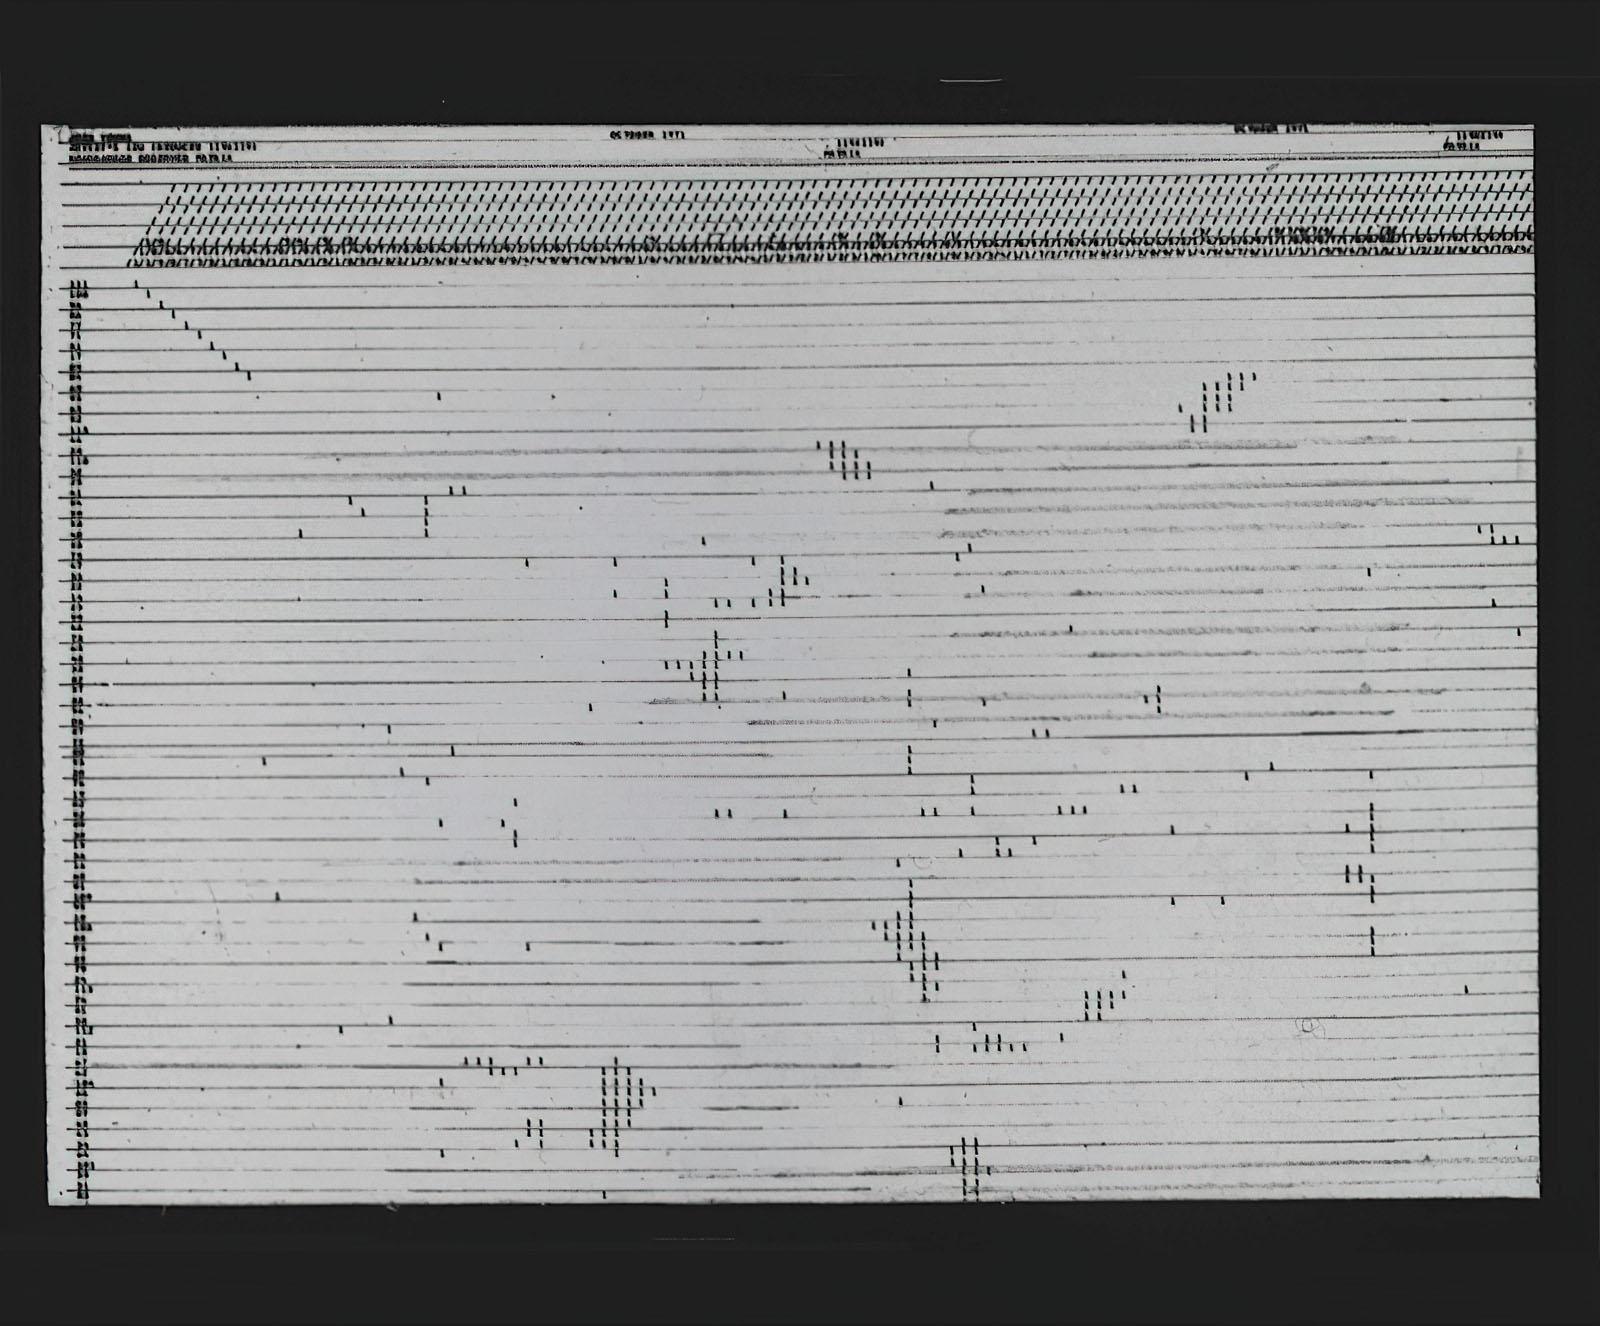 Joshua Young - Artists / BU rearranged observed matrix